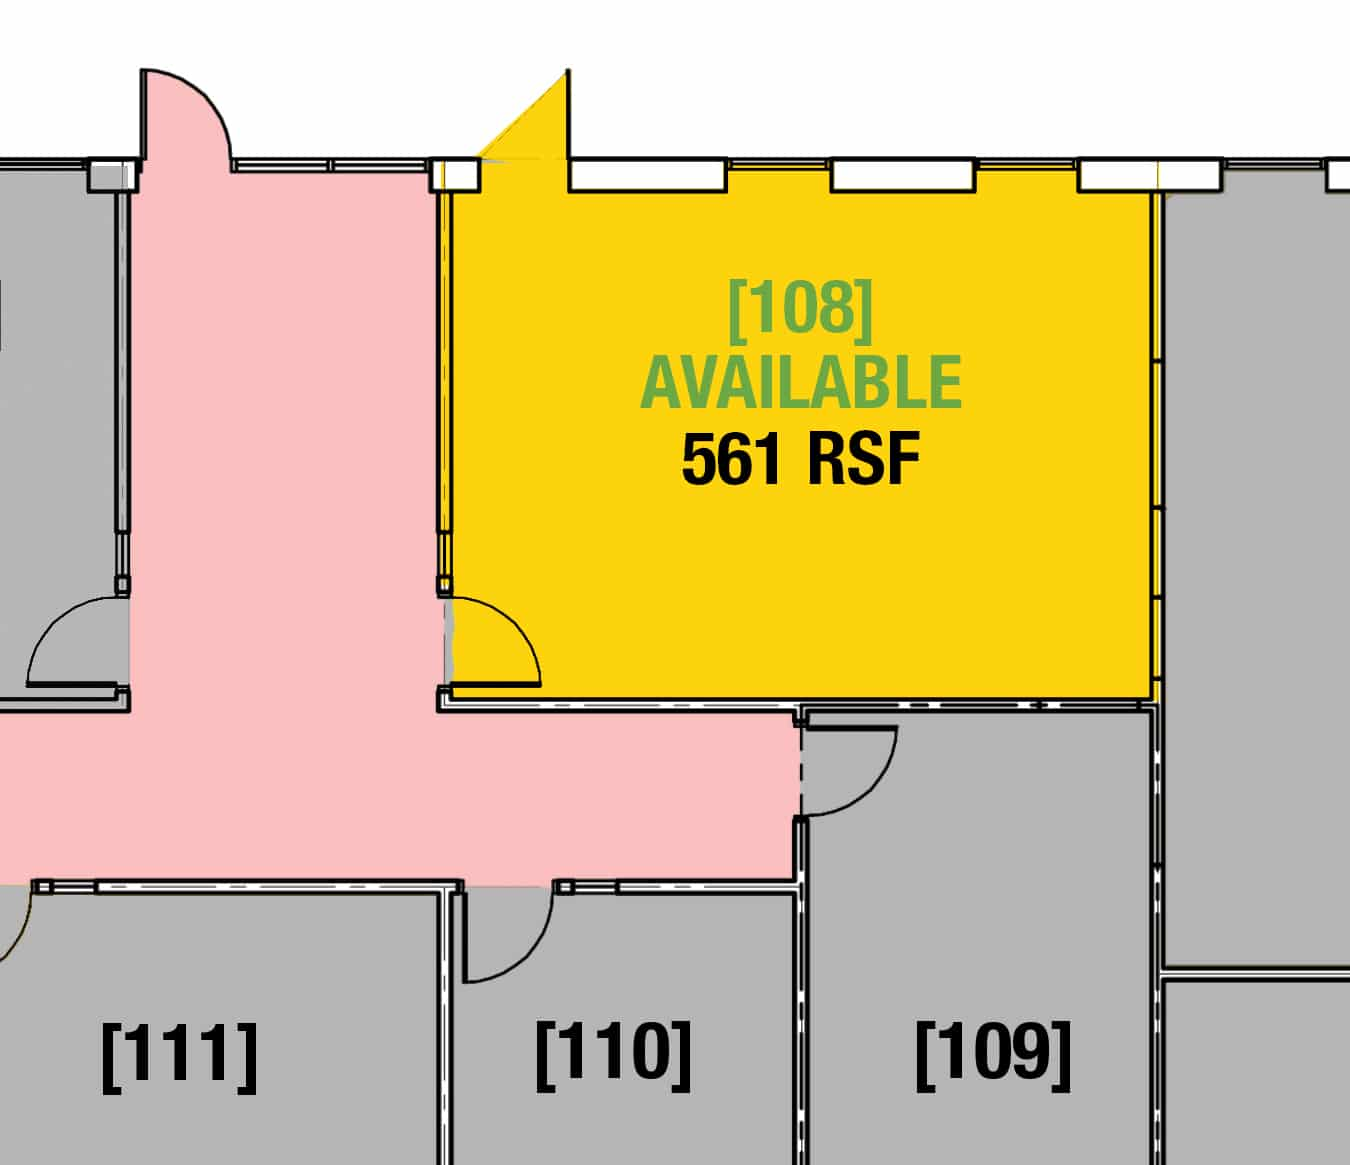 SUITE 208- 413 RSF